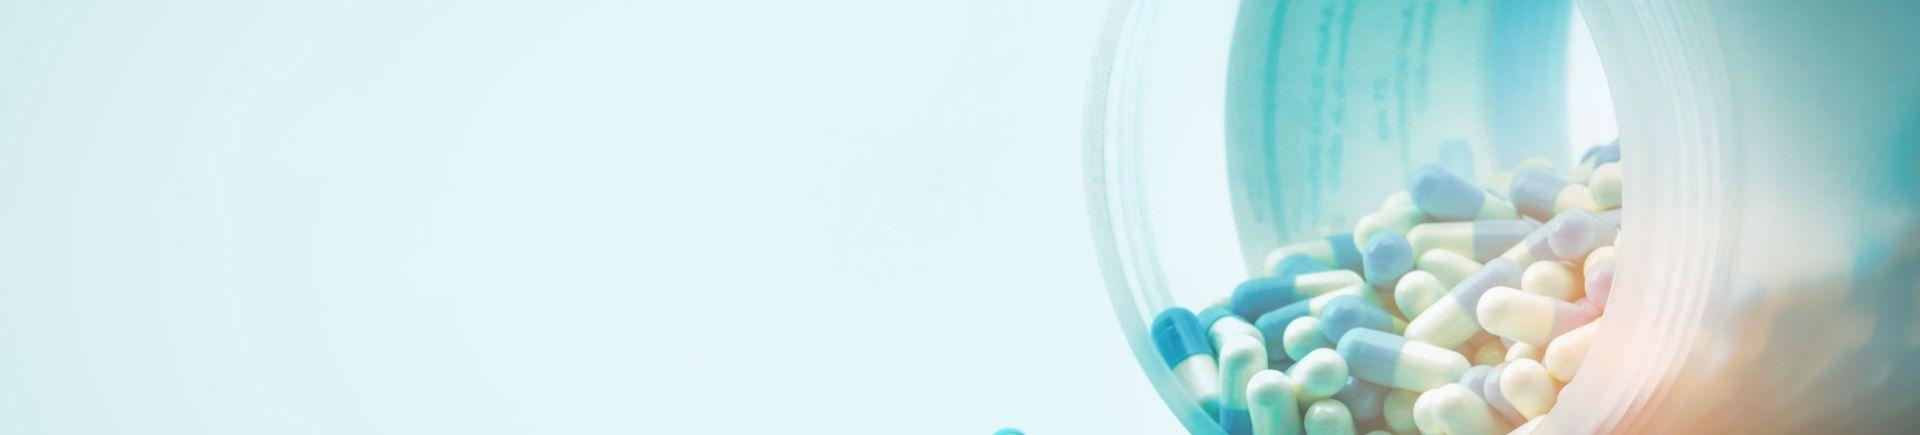 Global pharmaceutical